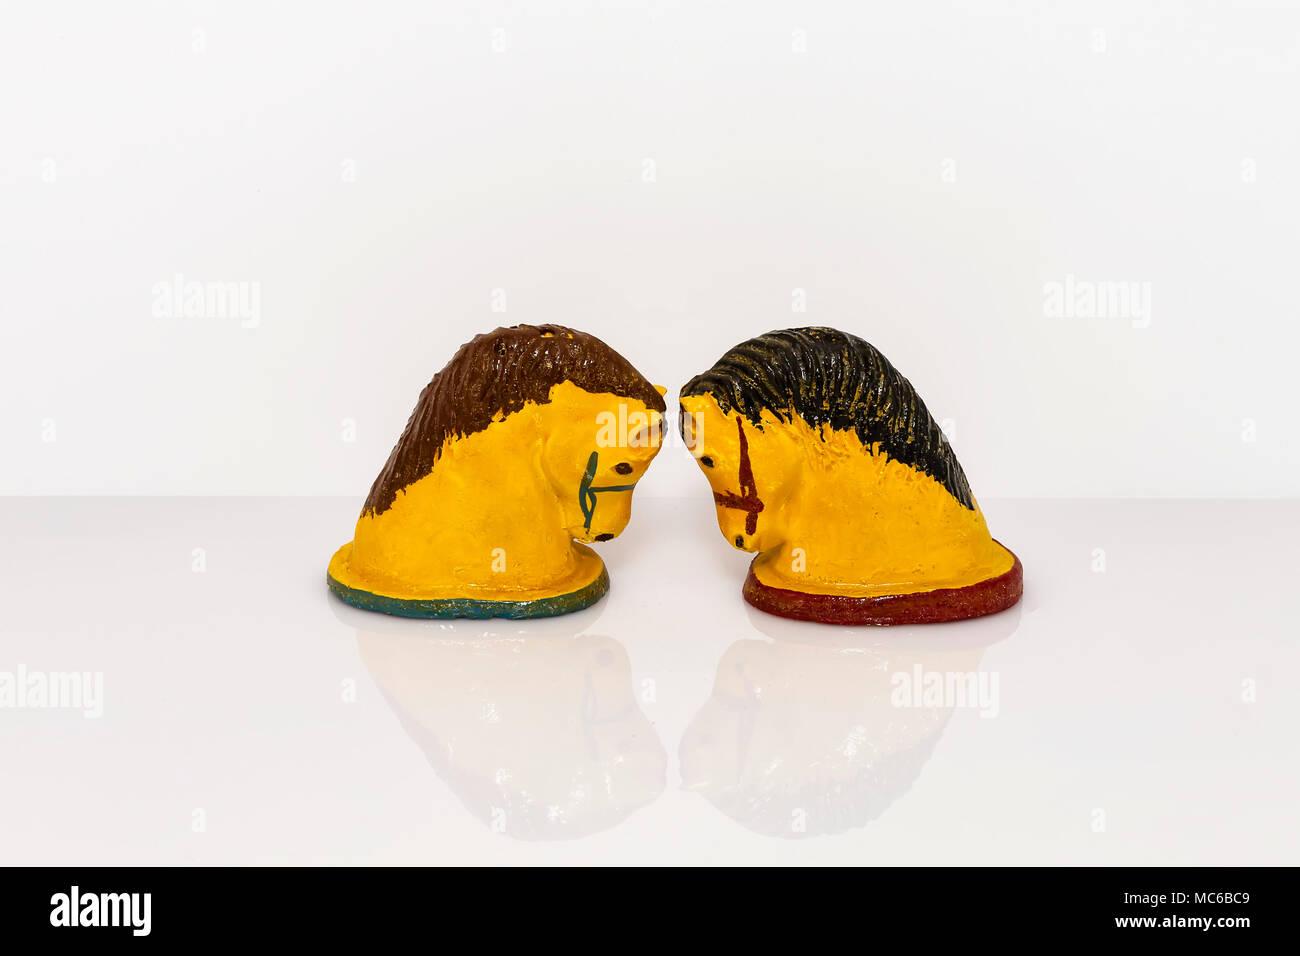 plaster cast replica of a horses head salt and pepper shaker set - Stock Image